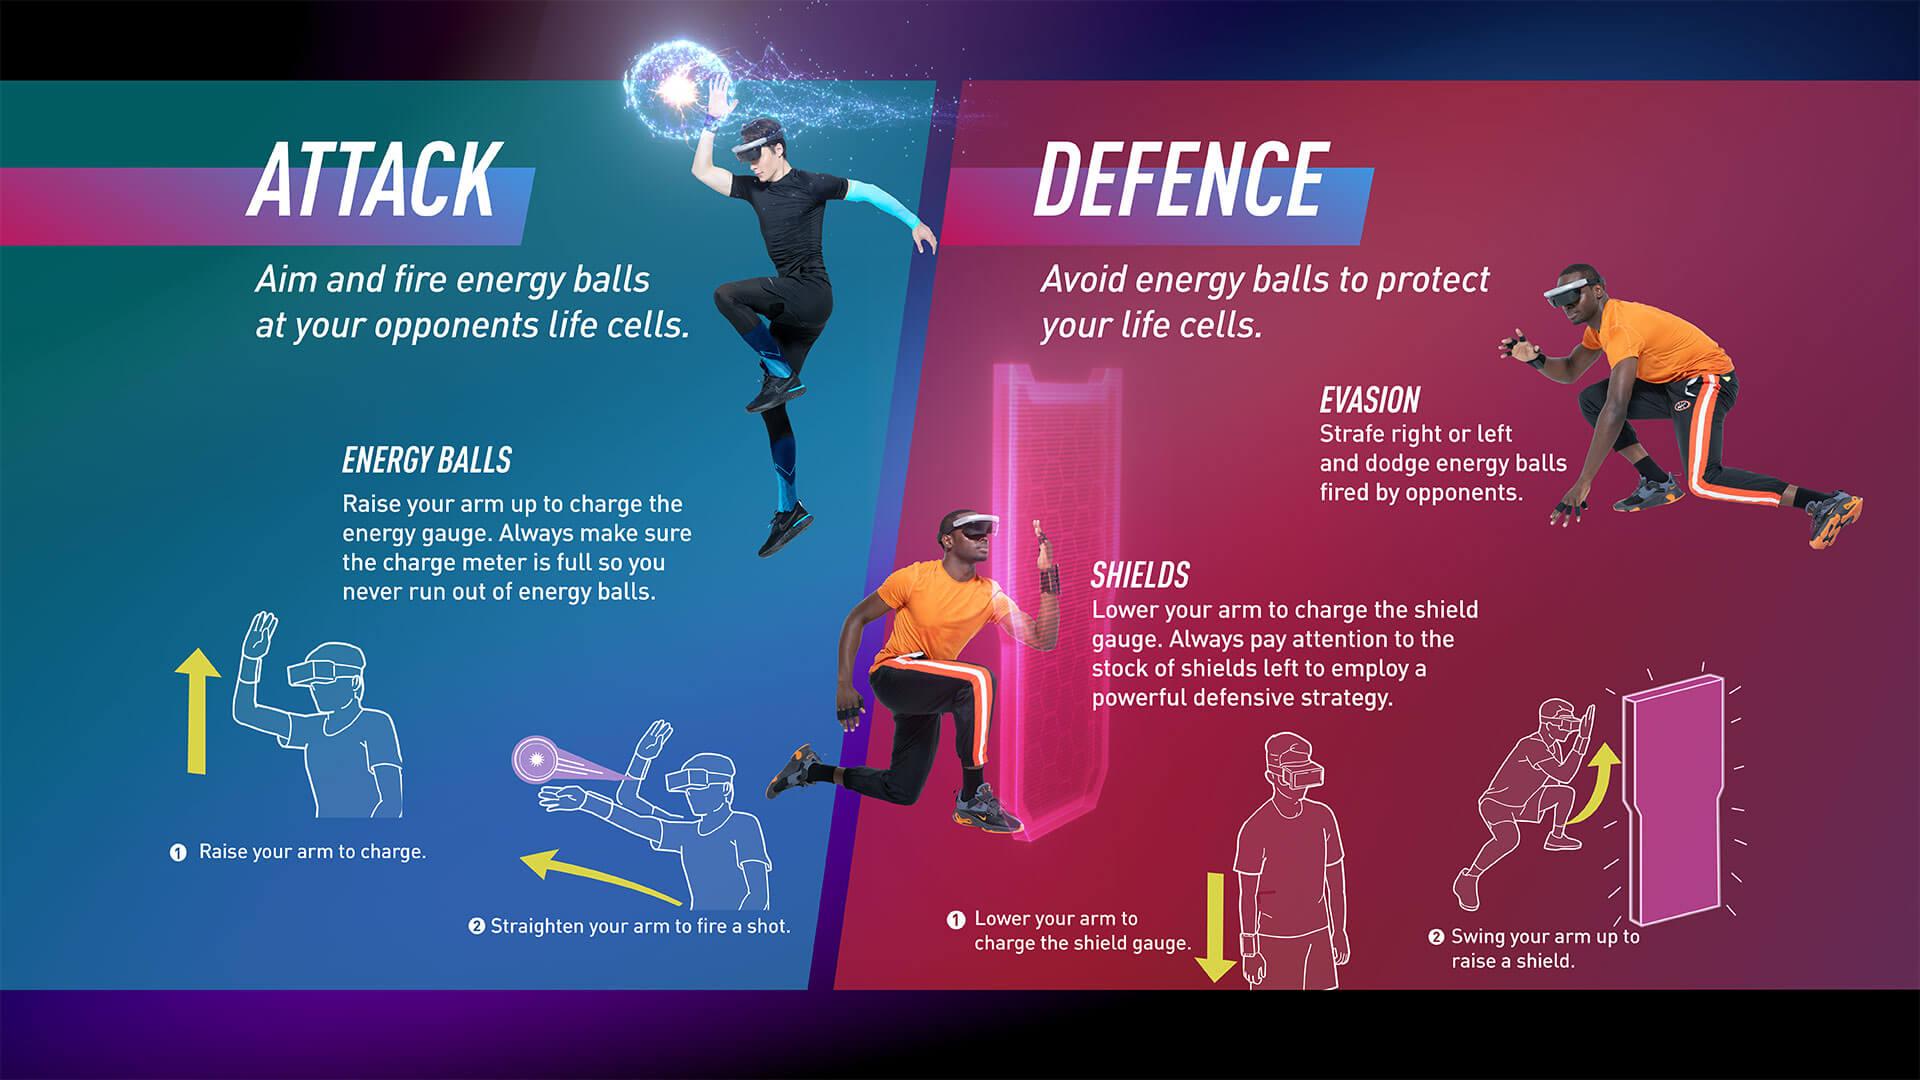 seccion-guia-ataque-defensa